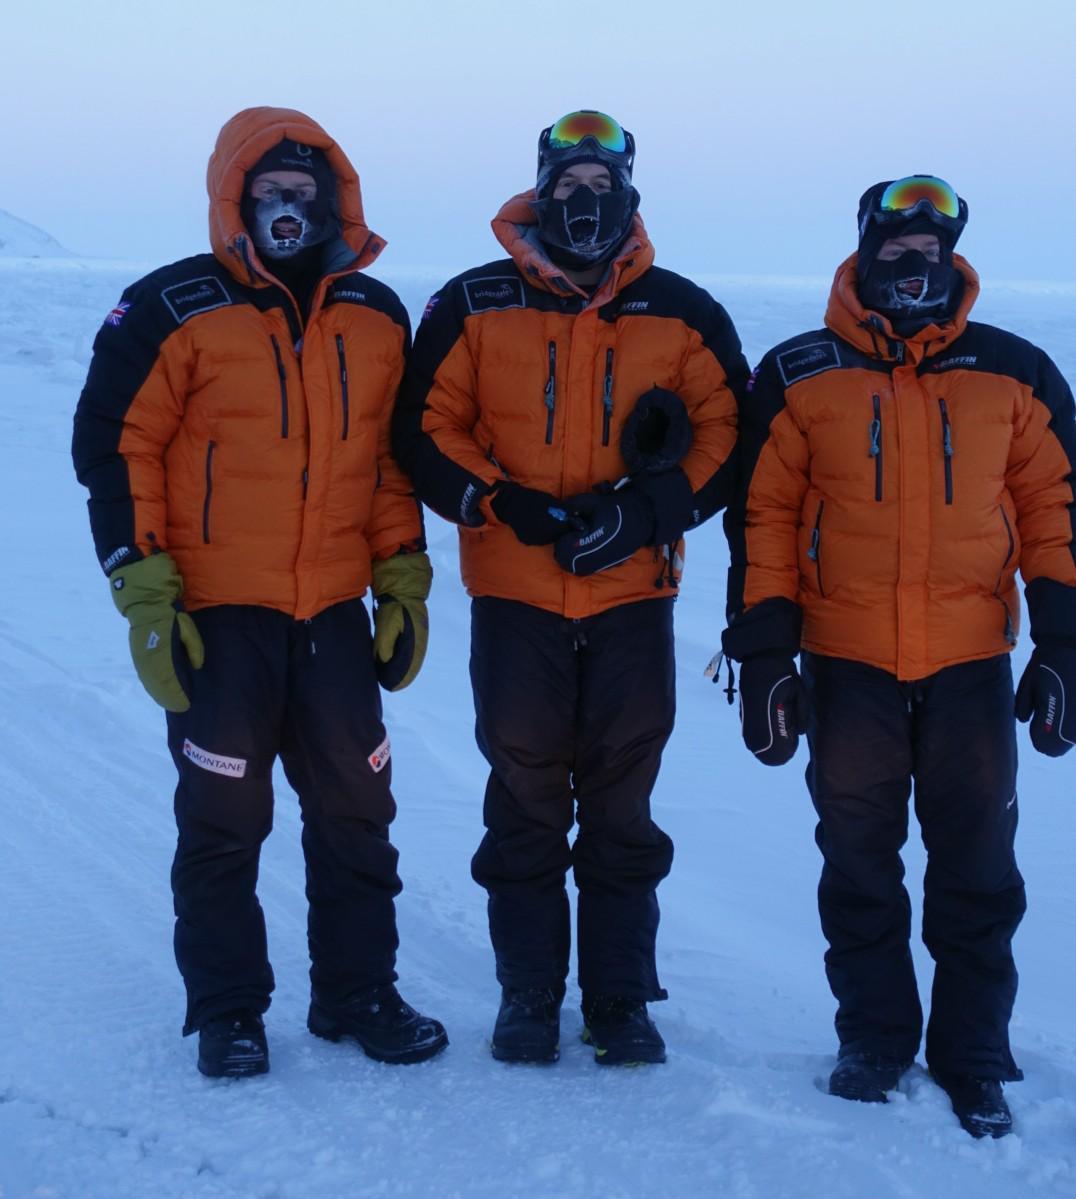 Guess who's who? Jamie, Benno & me earlier in #Nunavut. #WhosWho @BridgedaleSocks @baffinworldwide @bloceyewear http://t.co/CeVZBj90on